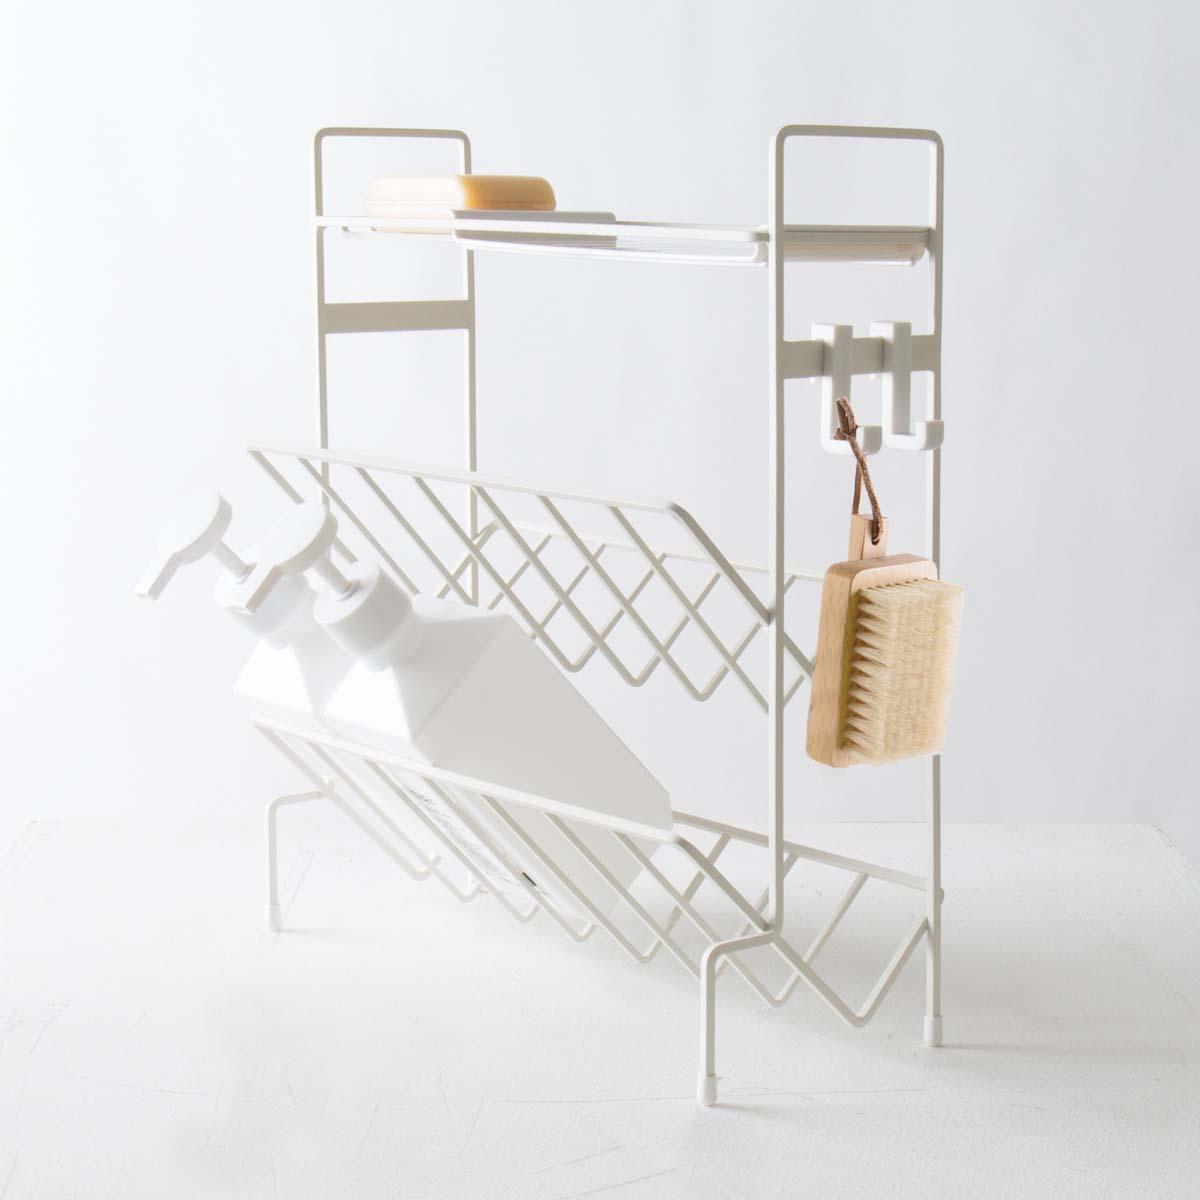 sarasa-designstore | Rakuten Global Market: Shampoo racks rack ...